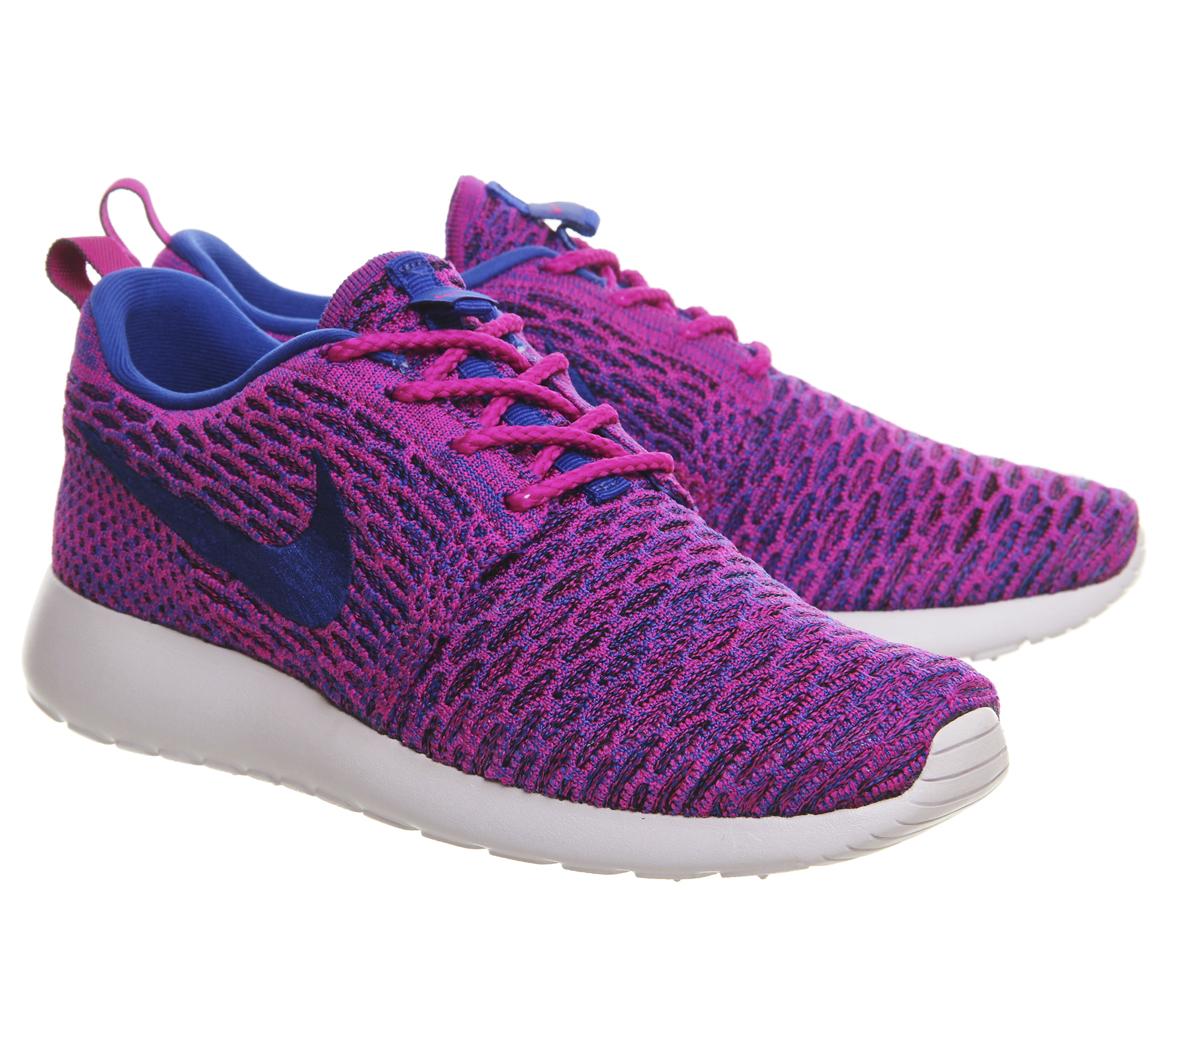 Nike Roshe Run Flyknit (w) in Fuchsia